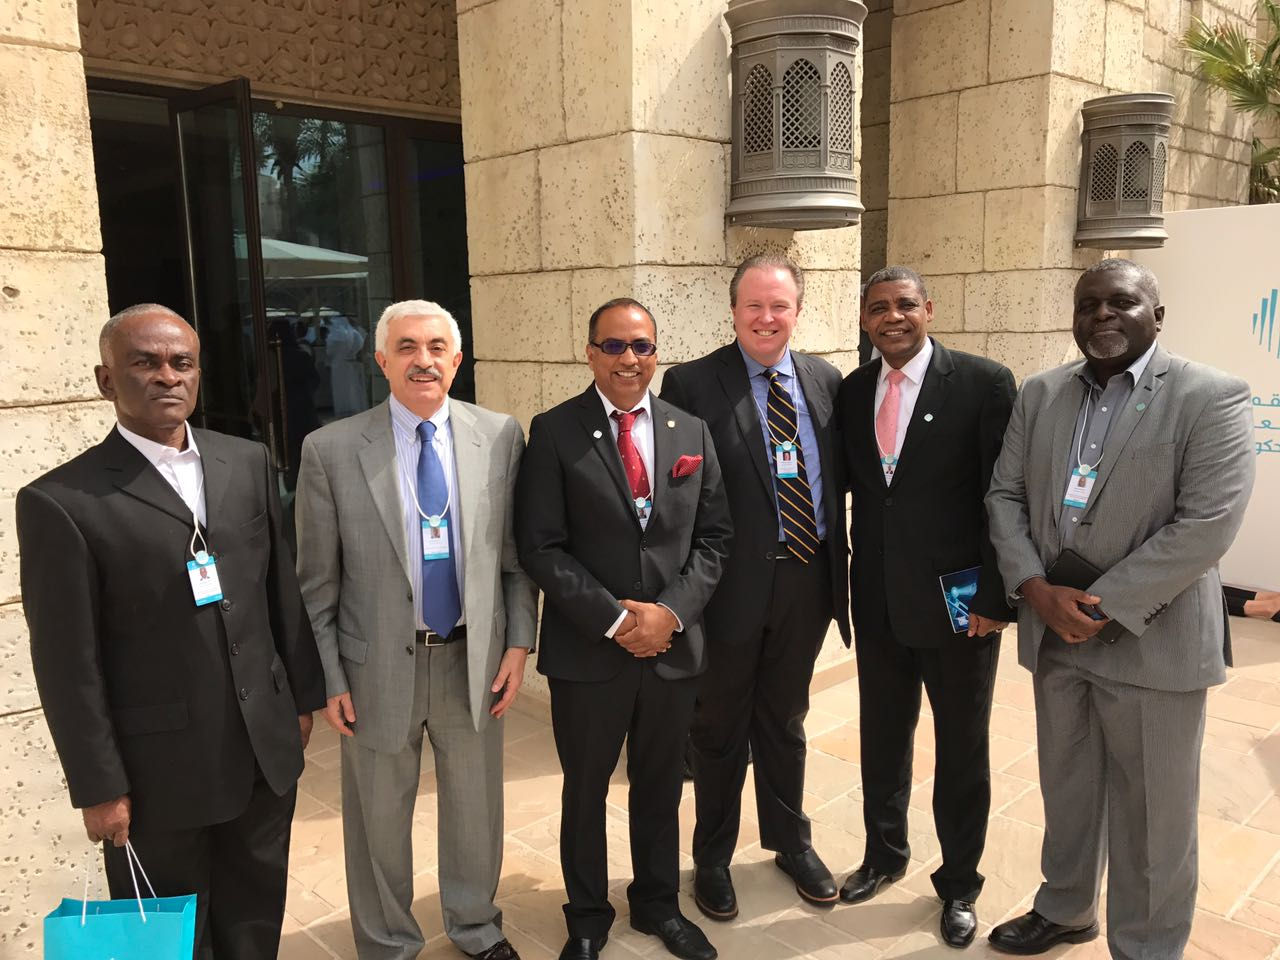 ICAP participa en Cumbre Mundial de Gobiernos en Dubai